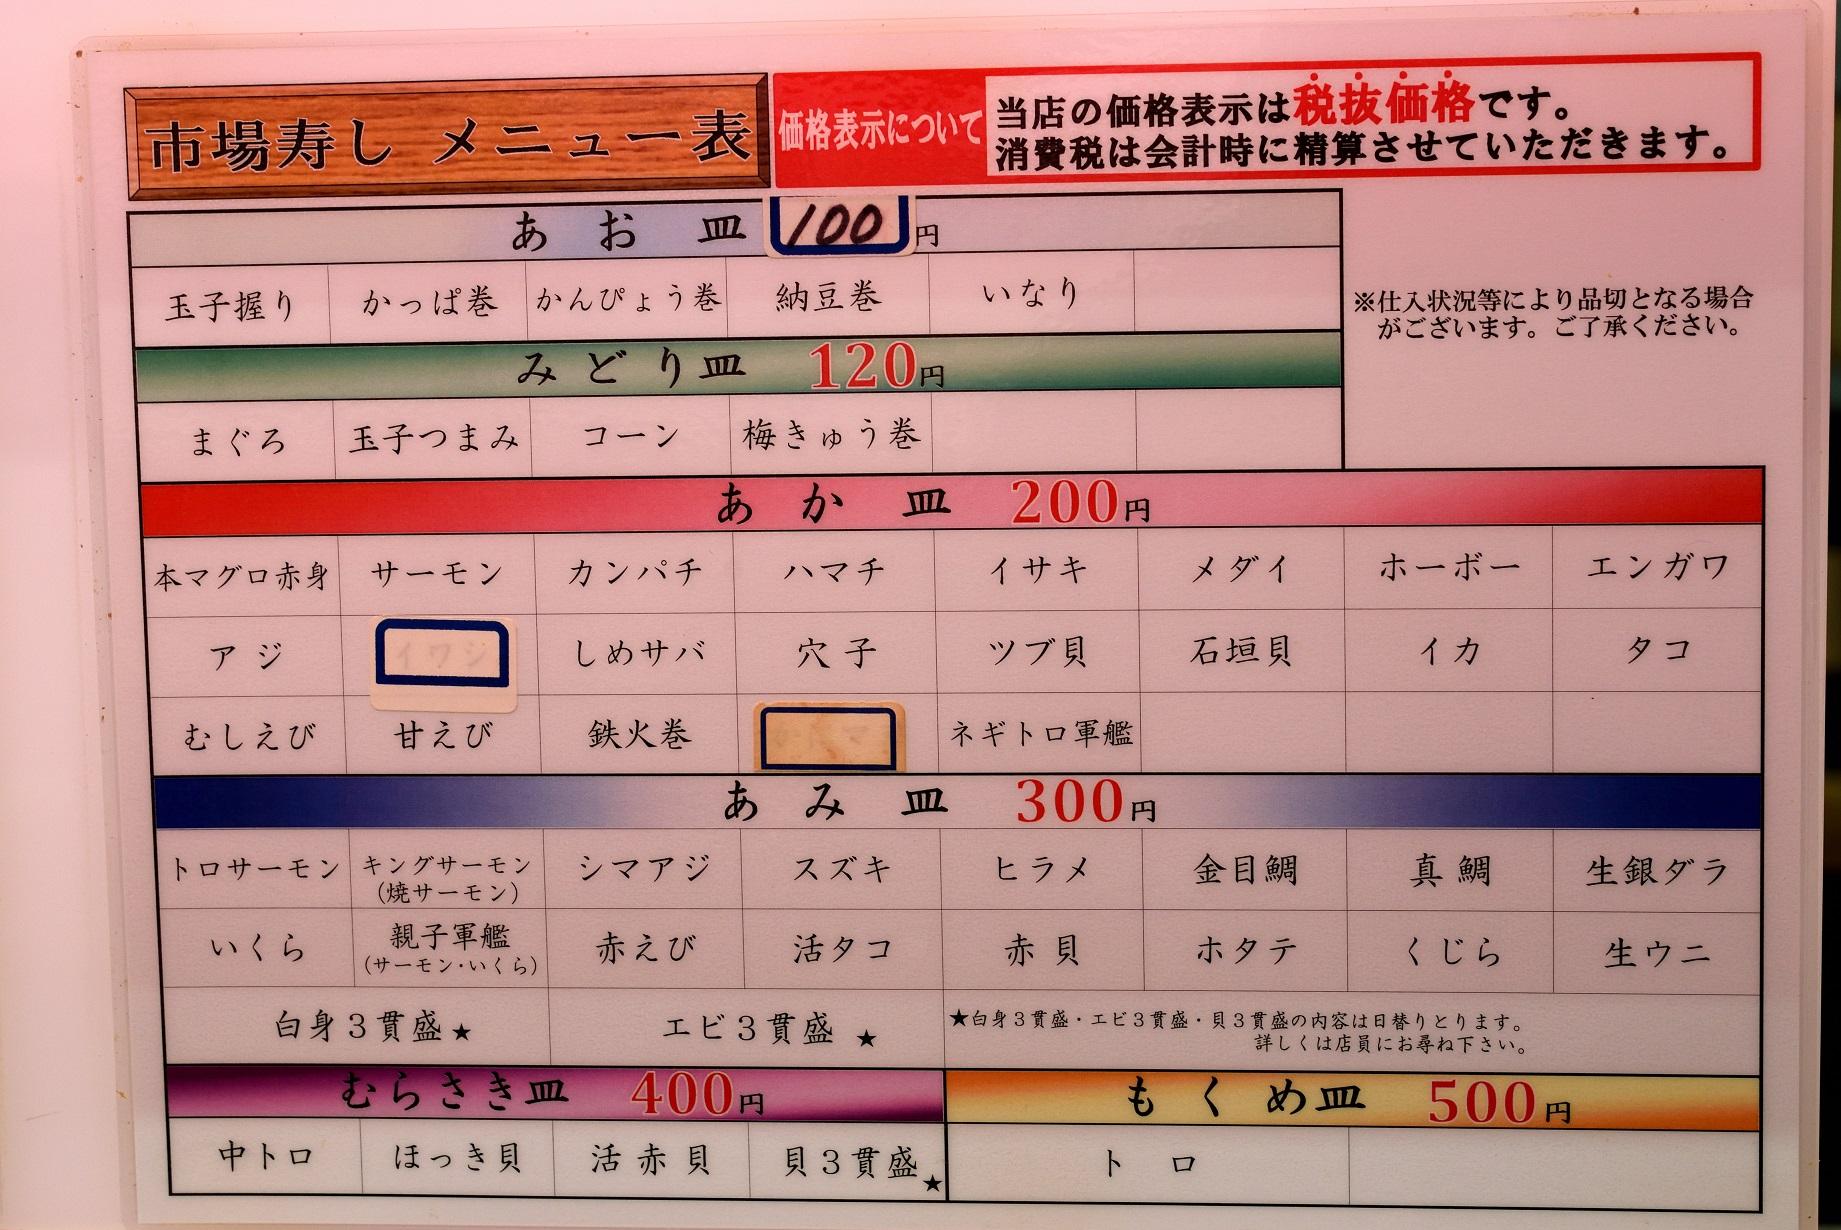 那珂湊 市場寿司 メニュー